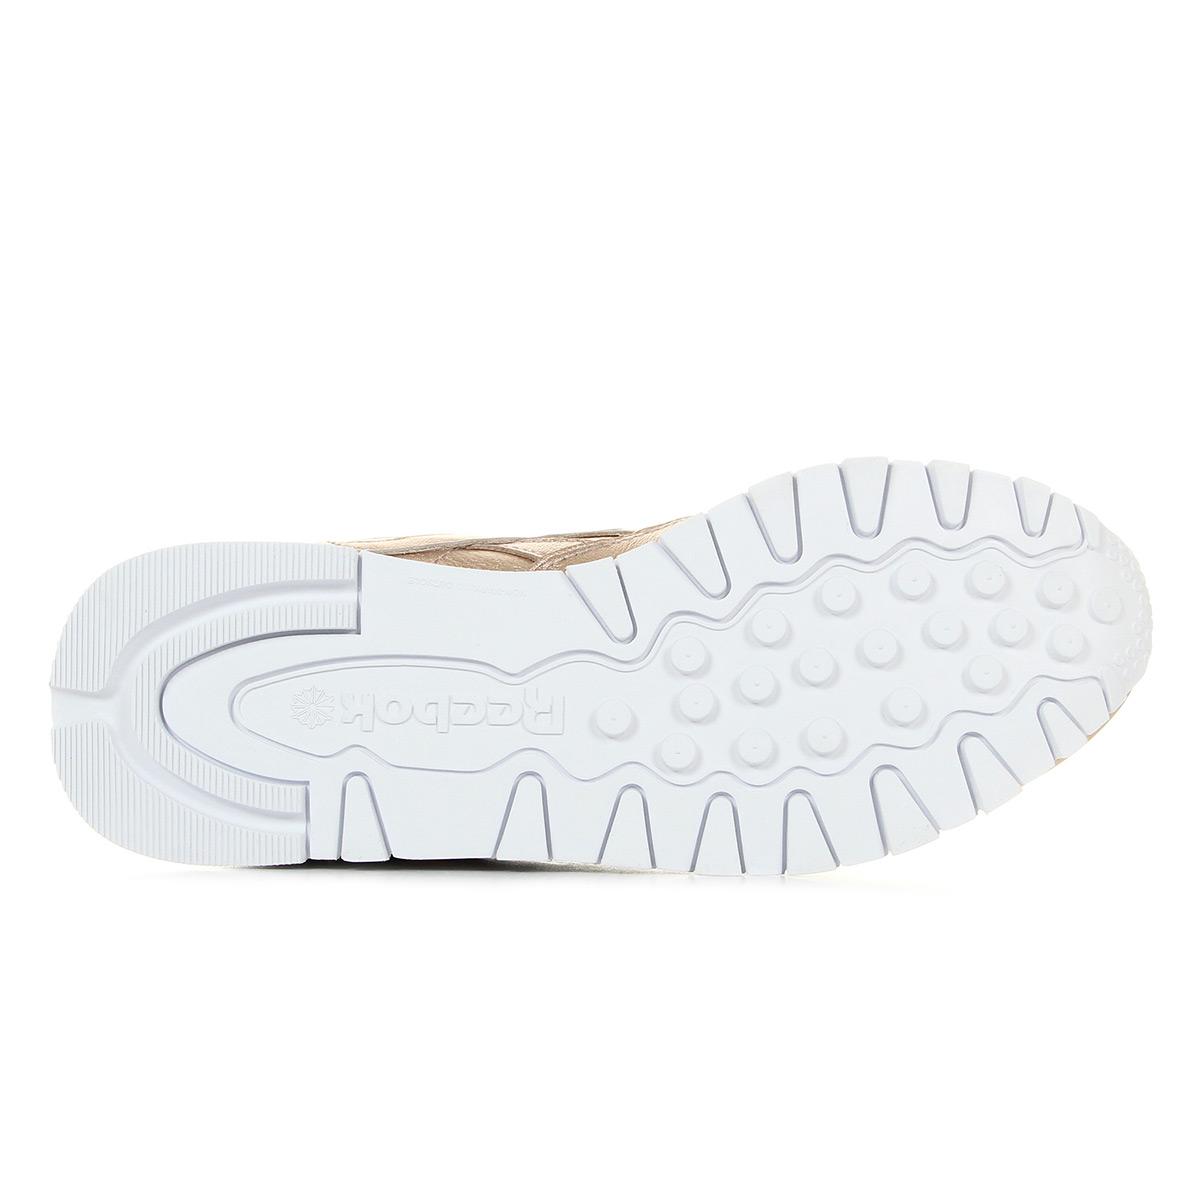 Reebok Cl Leather BS7897, Baskets mode femme